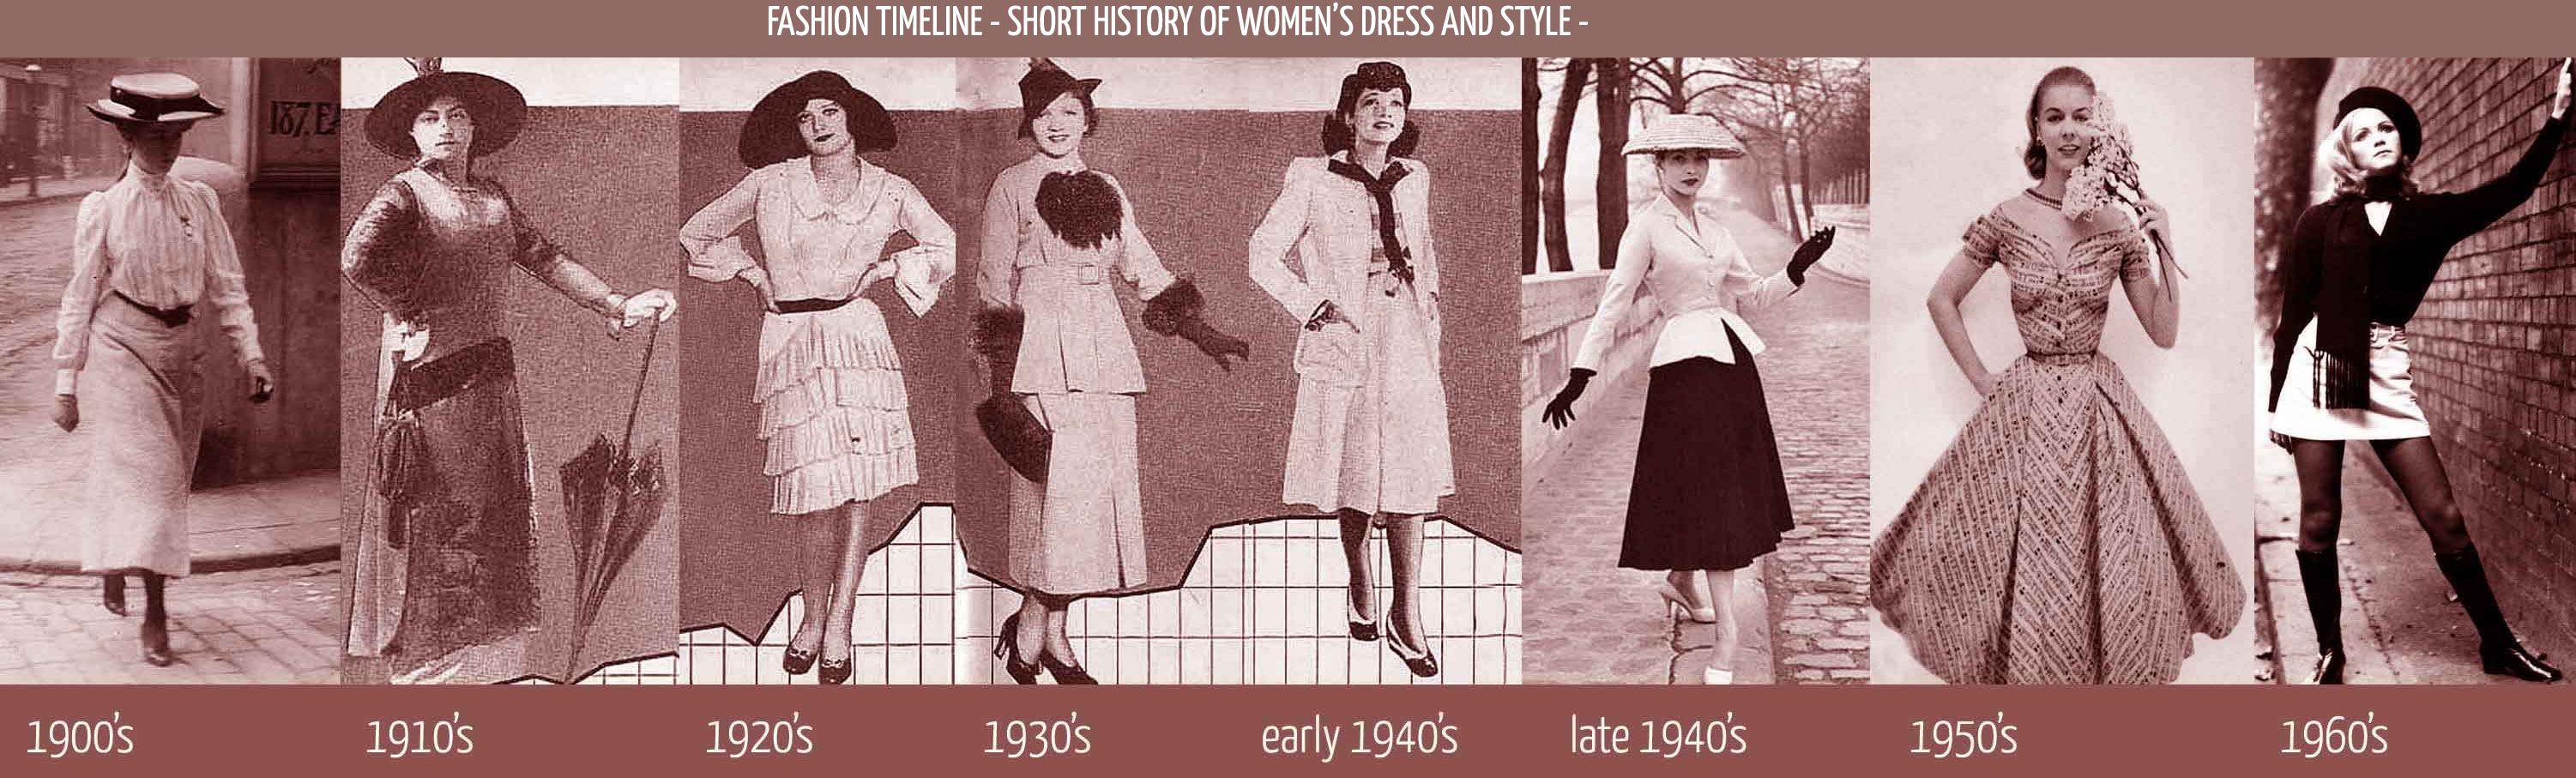 Fashion-Timeline-History-of-Womens-Dress-and-Styles-1900-to-1969.jpg (JPEG Imagen, 3003 × 907 píxeles) - Escalado (47%)